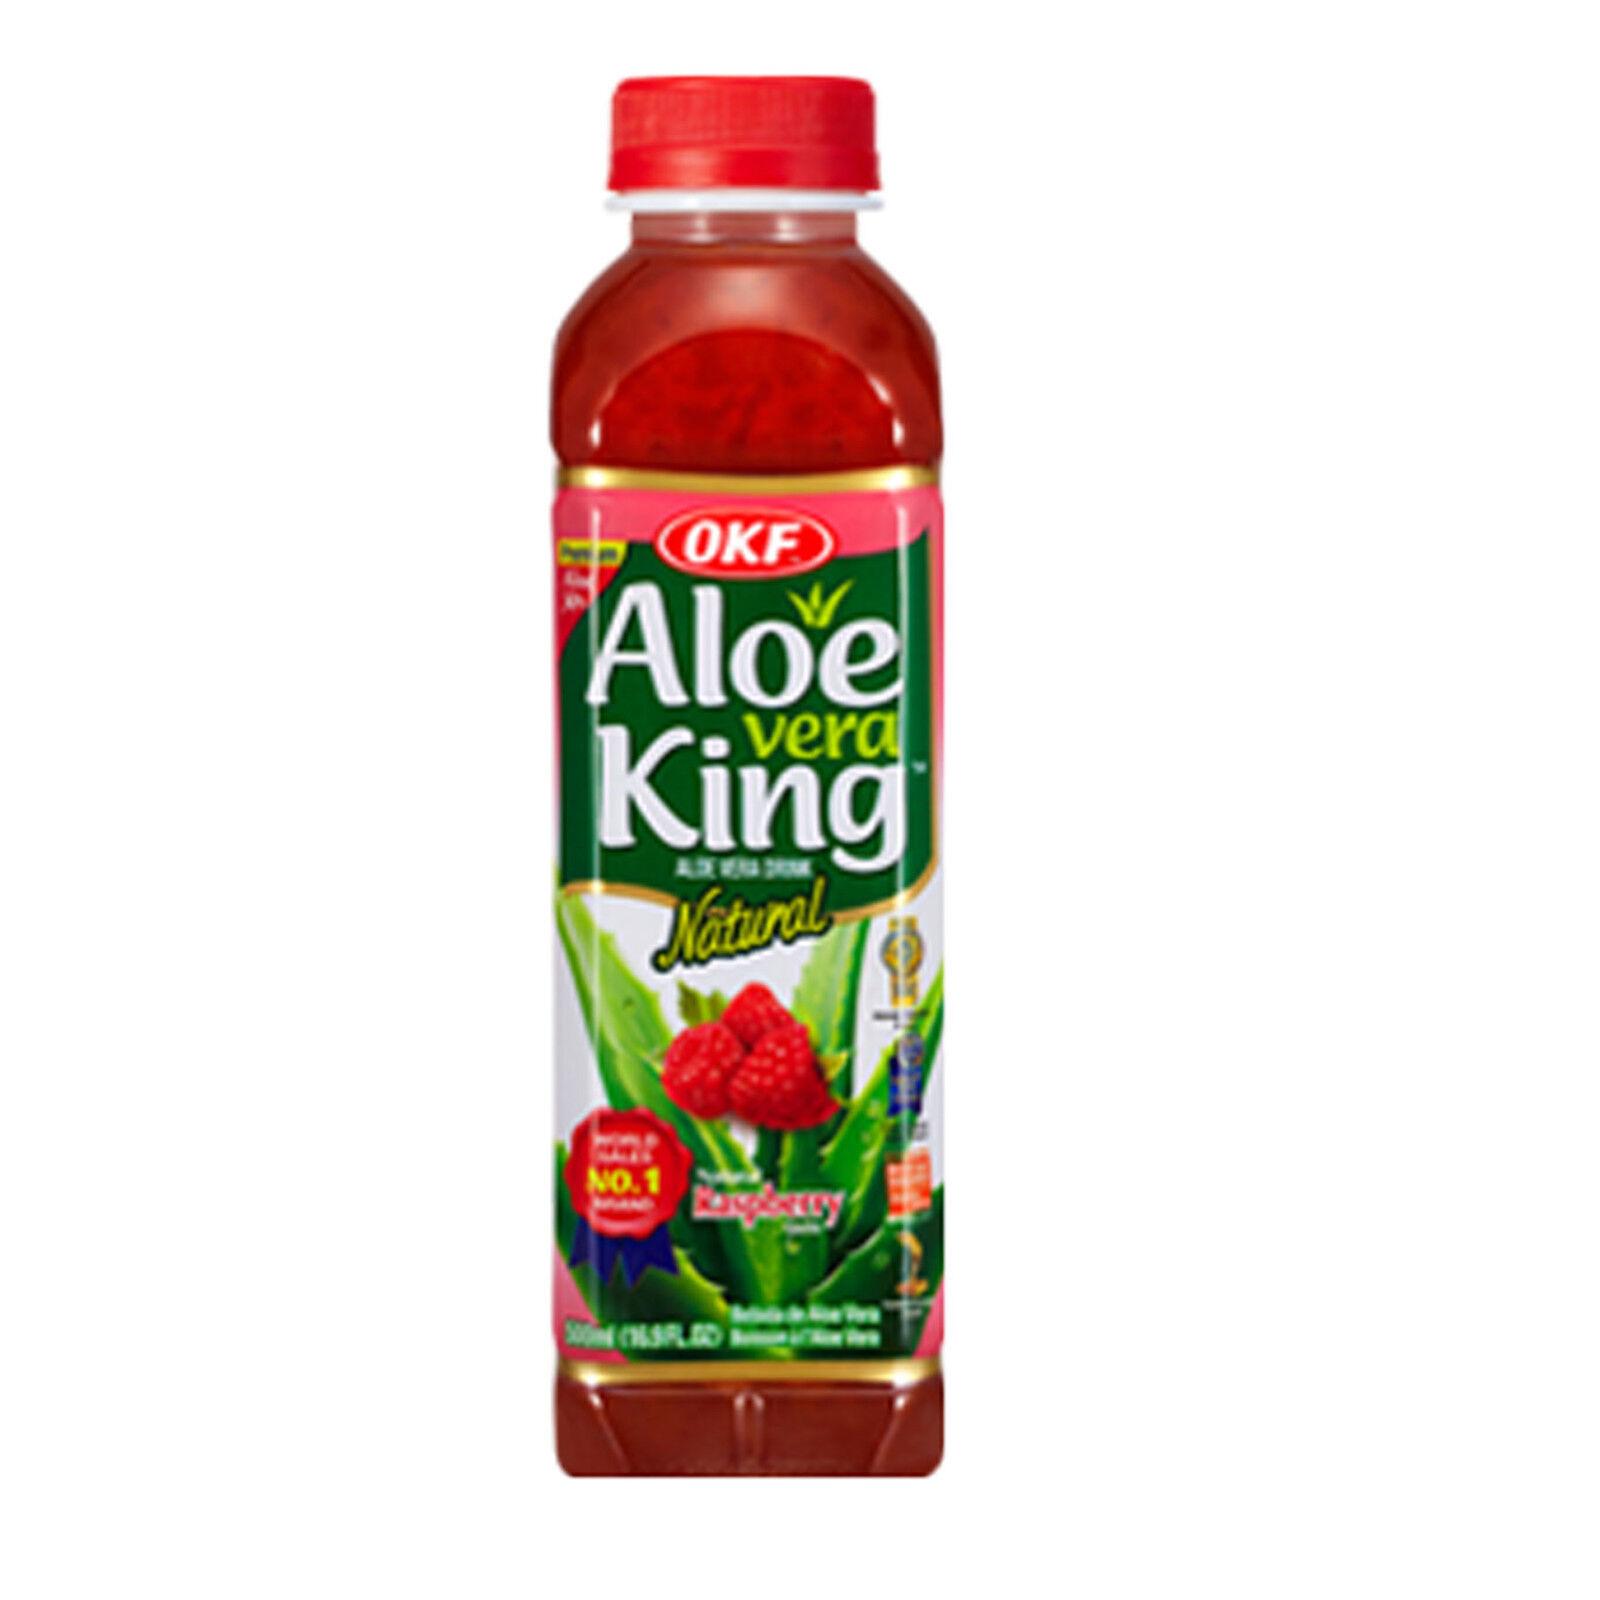 OKF Aloe Vera King Original 20 x 500ml Aloe Vera Getränk Drink Himbeere 10 L